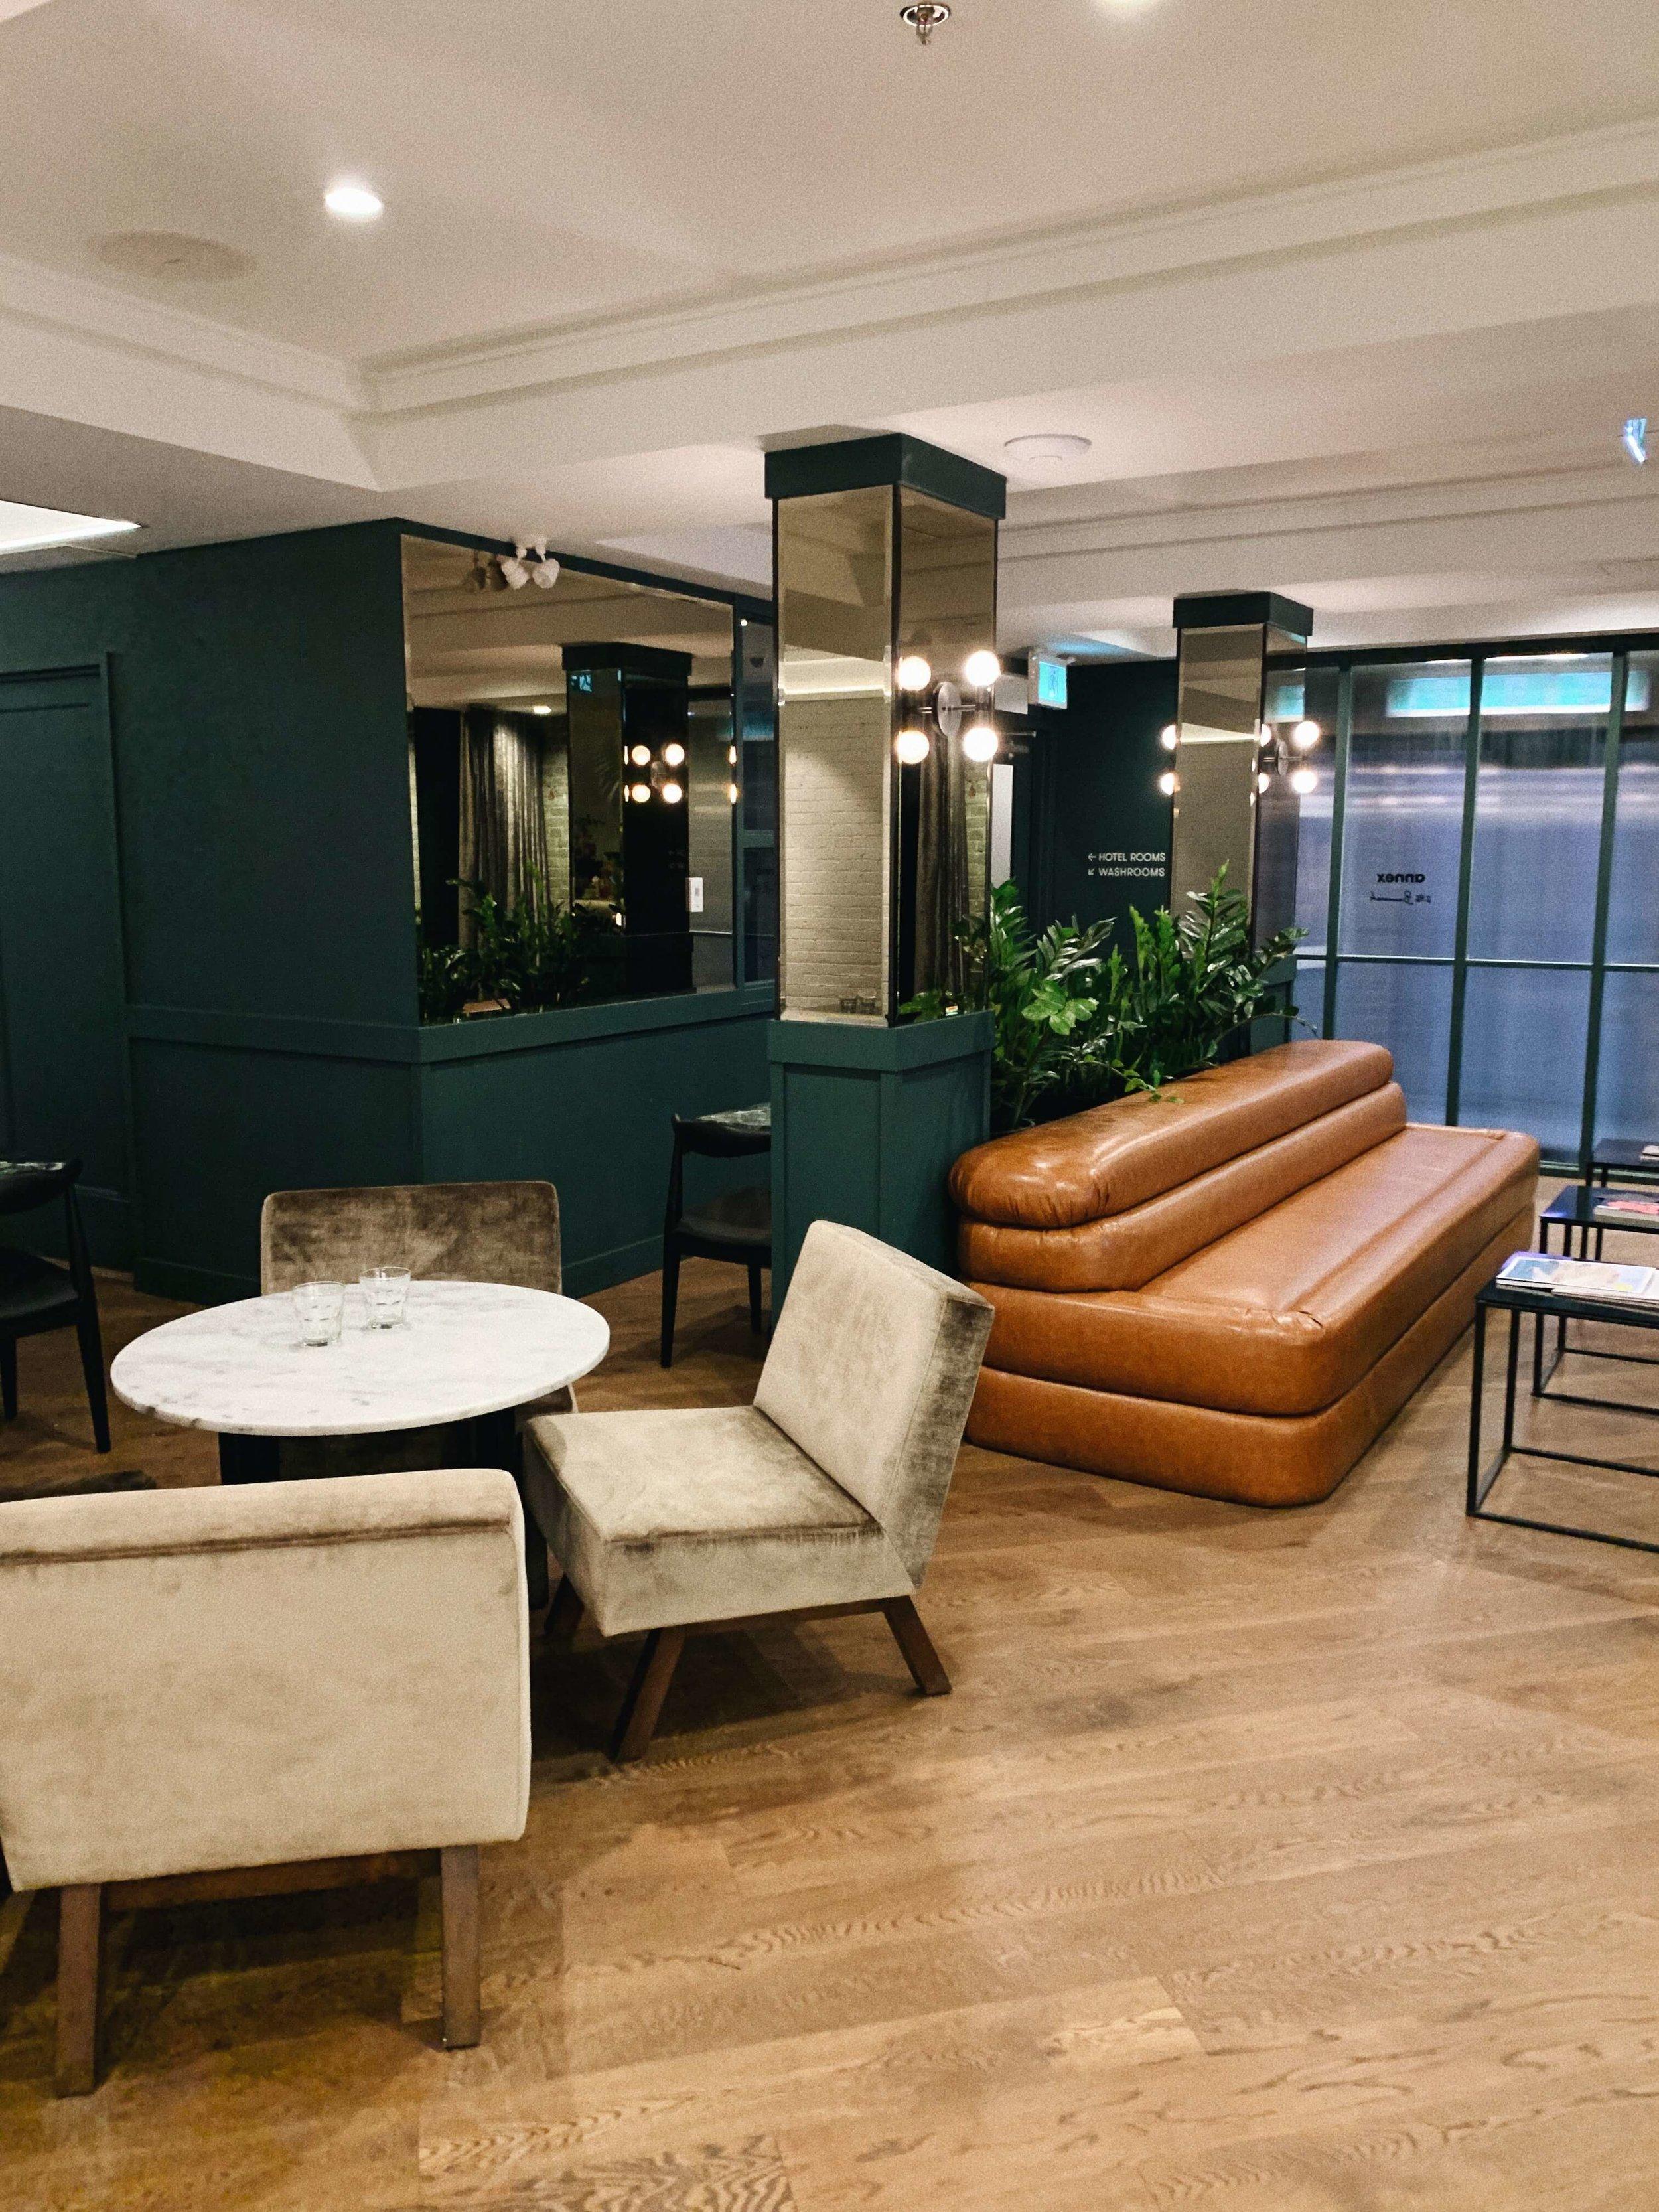 taraleighrose-annex-hotel-toronto-influencer-lobby-bar (1).JPG